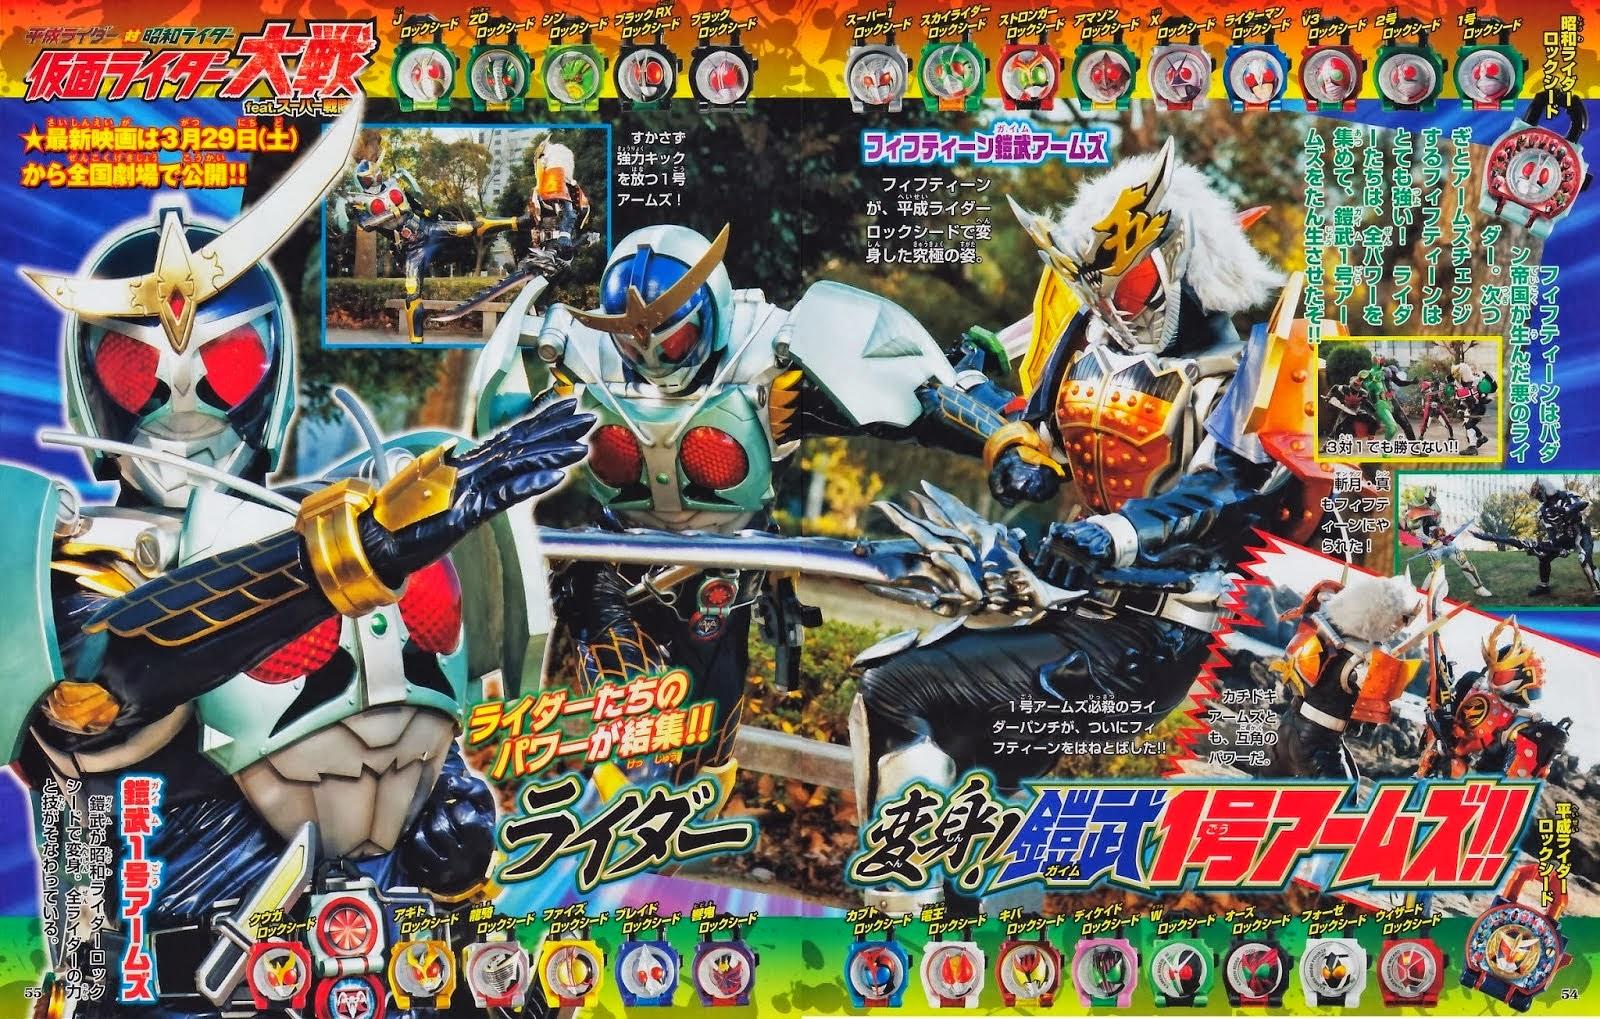 Preview Kamen Rider Taisen Ft Super Sentai Tendou Rider Rider Preview Kamen